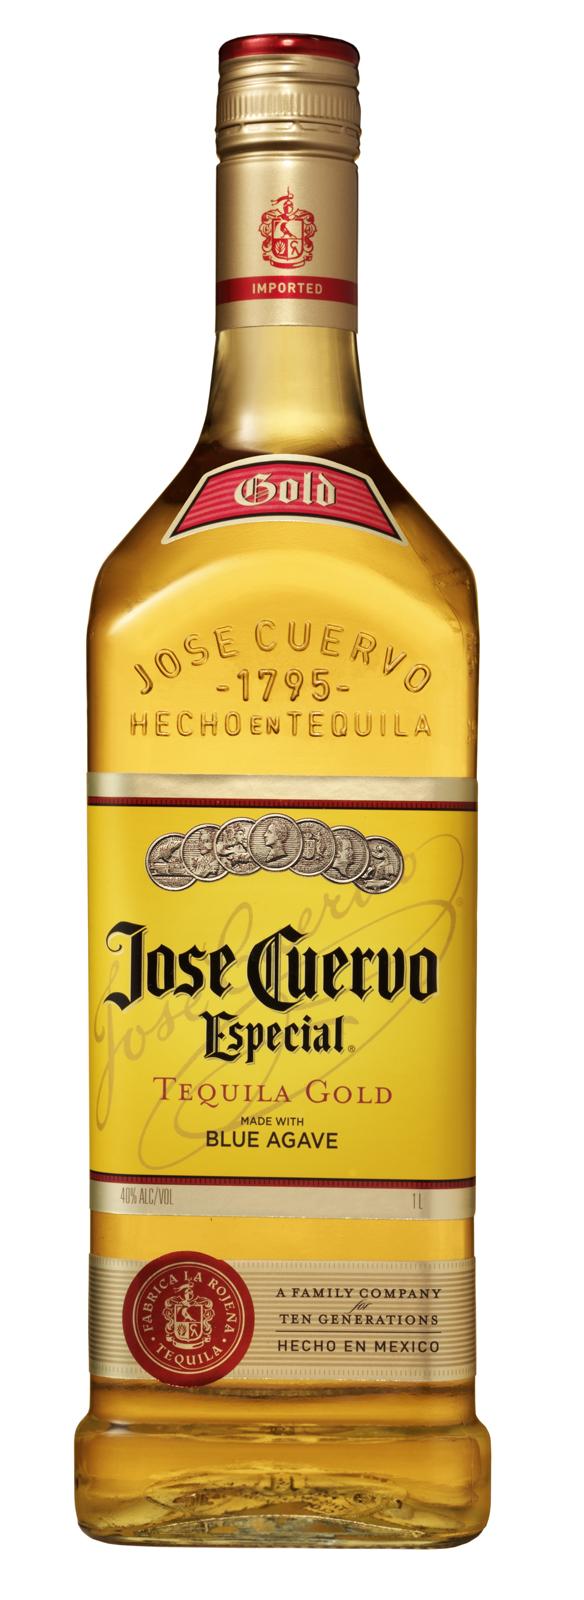 Tequila clipart Search pics pics … Search